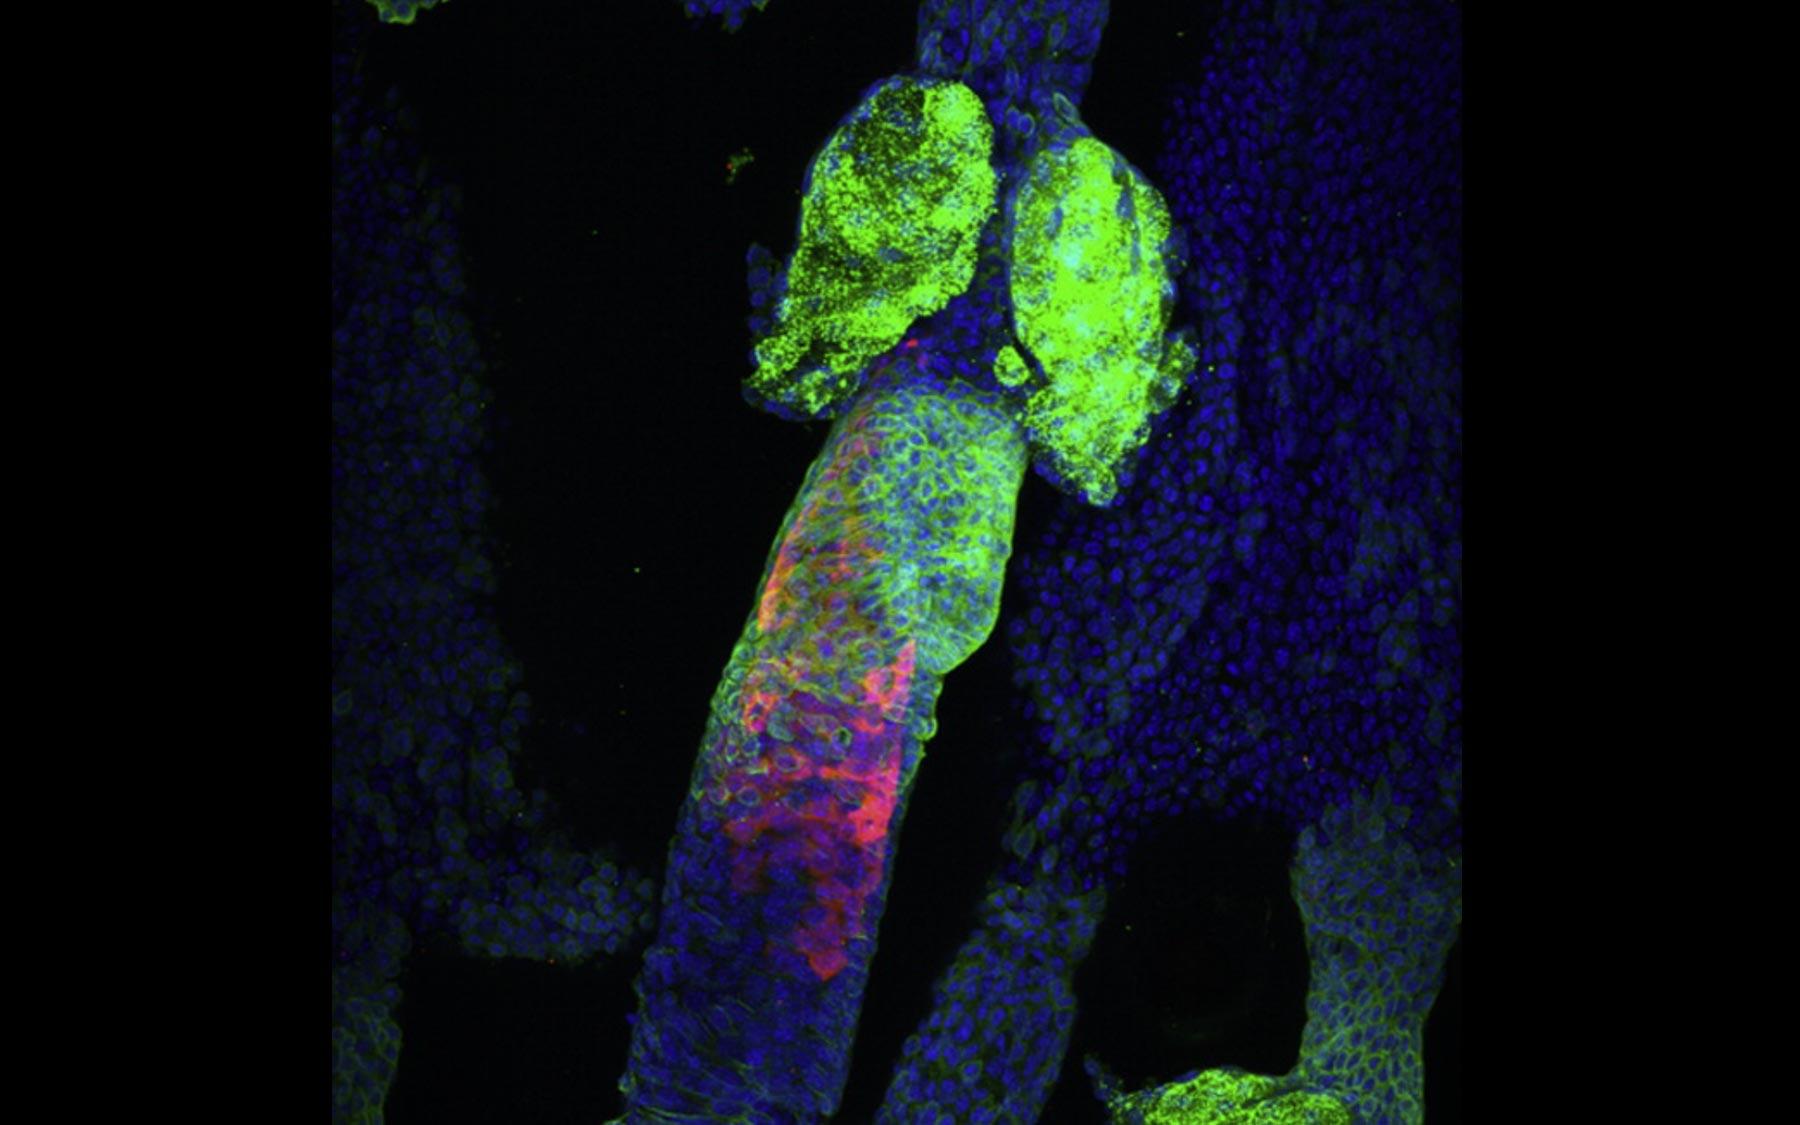 cancer genetic lesions cancer de piele din cauza solarului